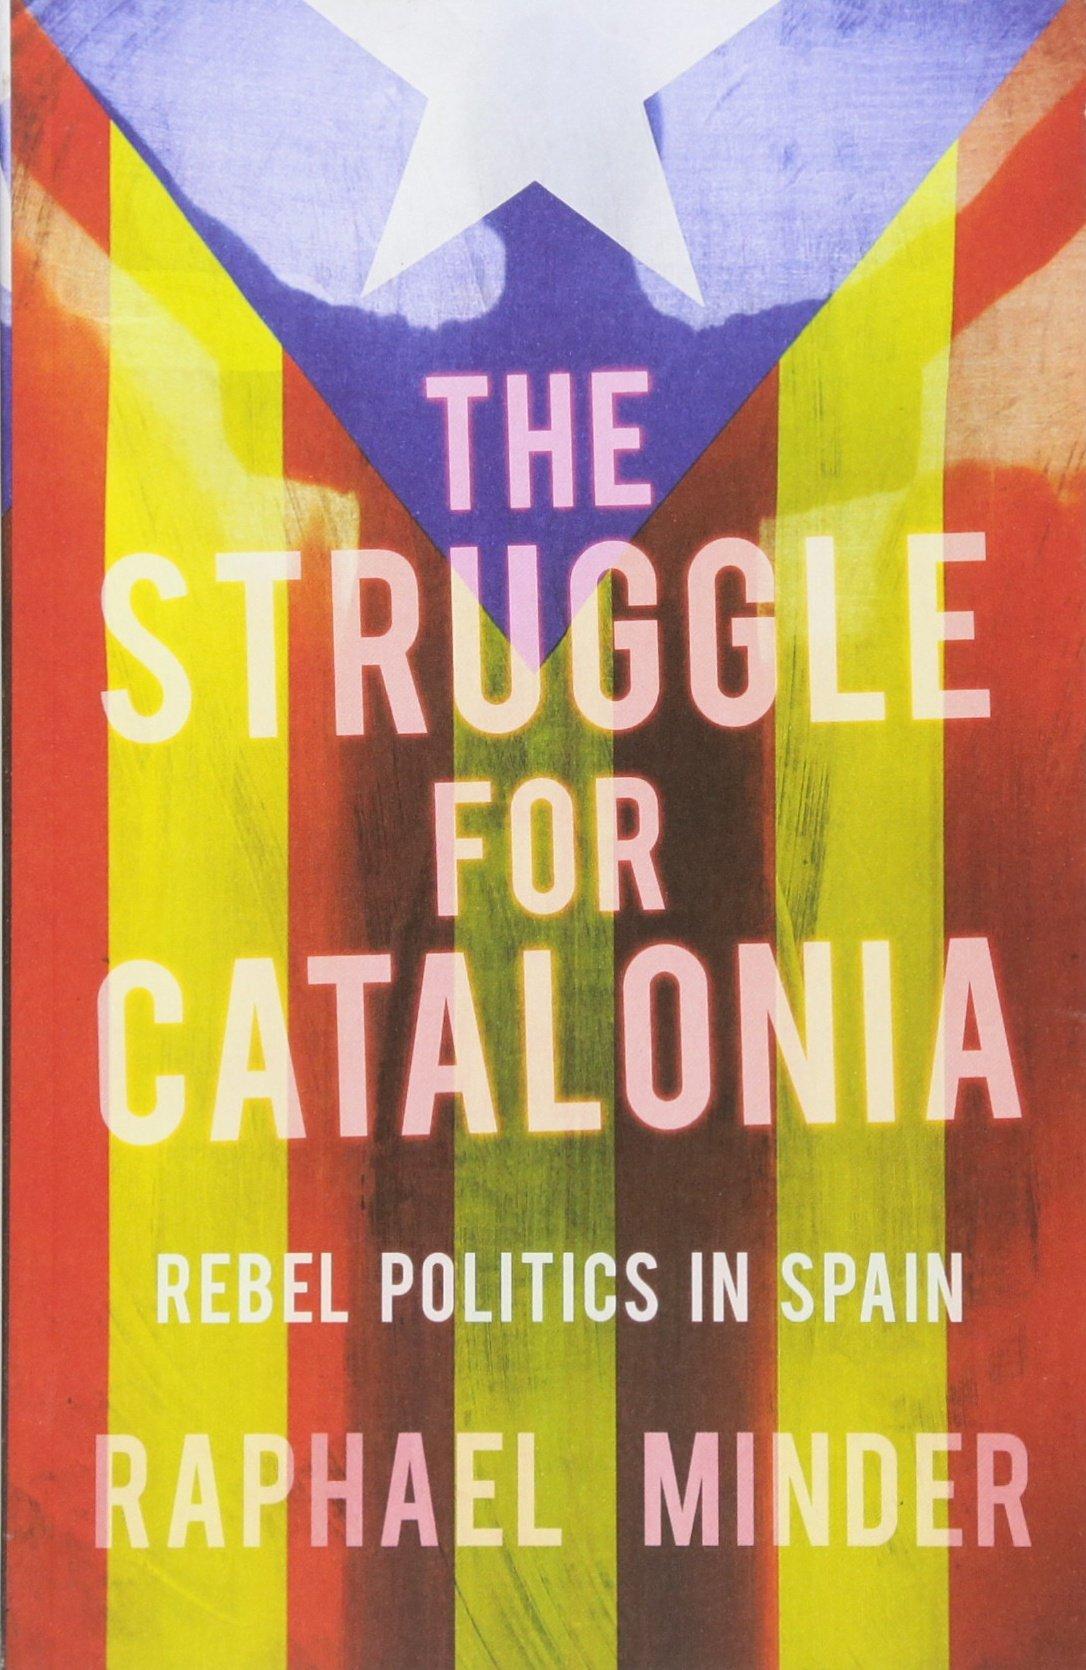 The Struggle For Catalonia: Rebel Politics in Spain: Amazon.es: Minder, Raphael, Minder, Raphael: Libros en idiomas extranjeros